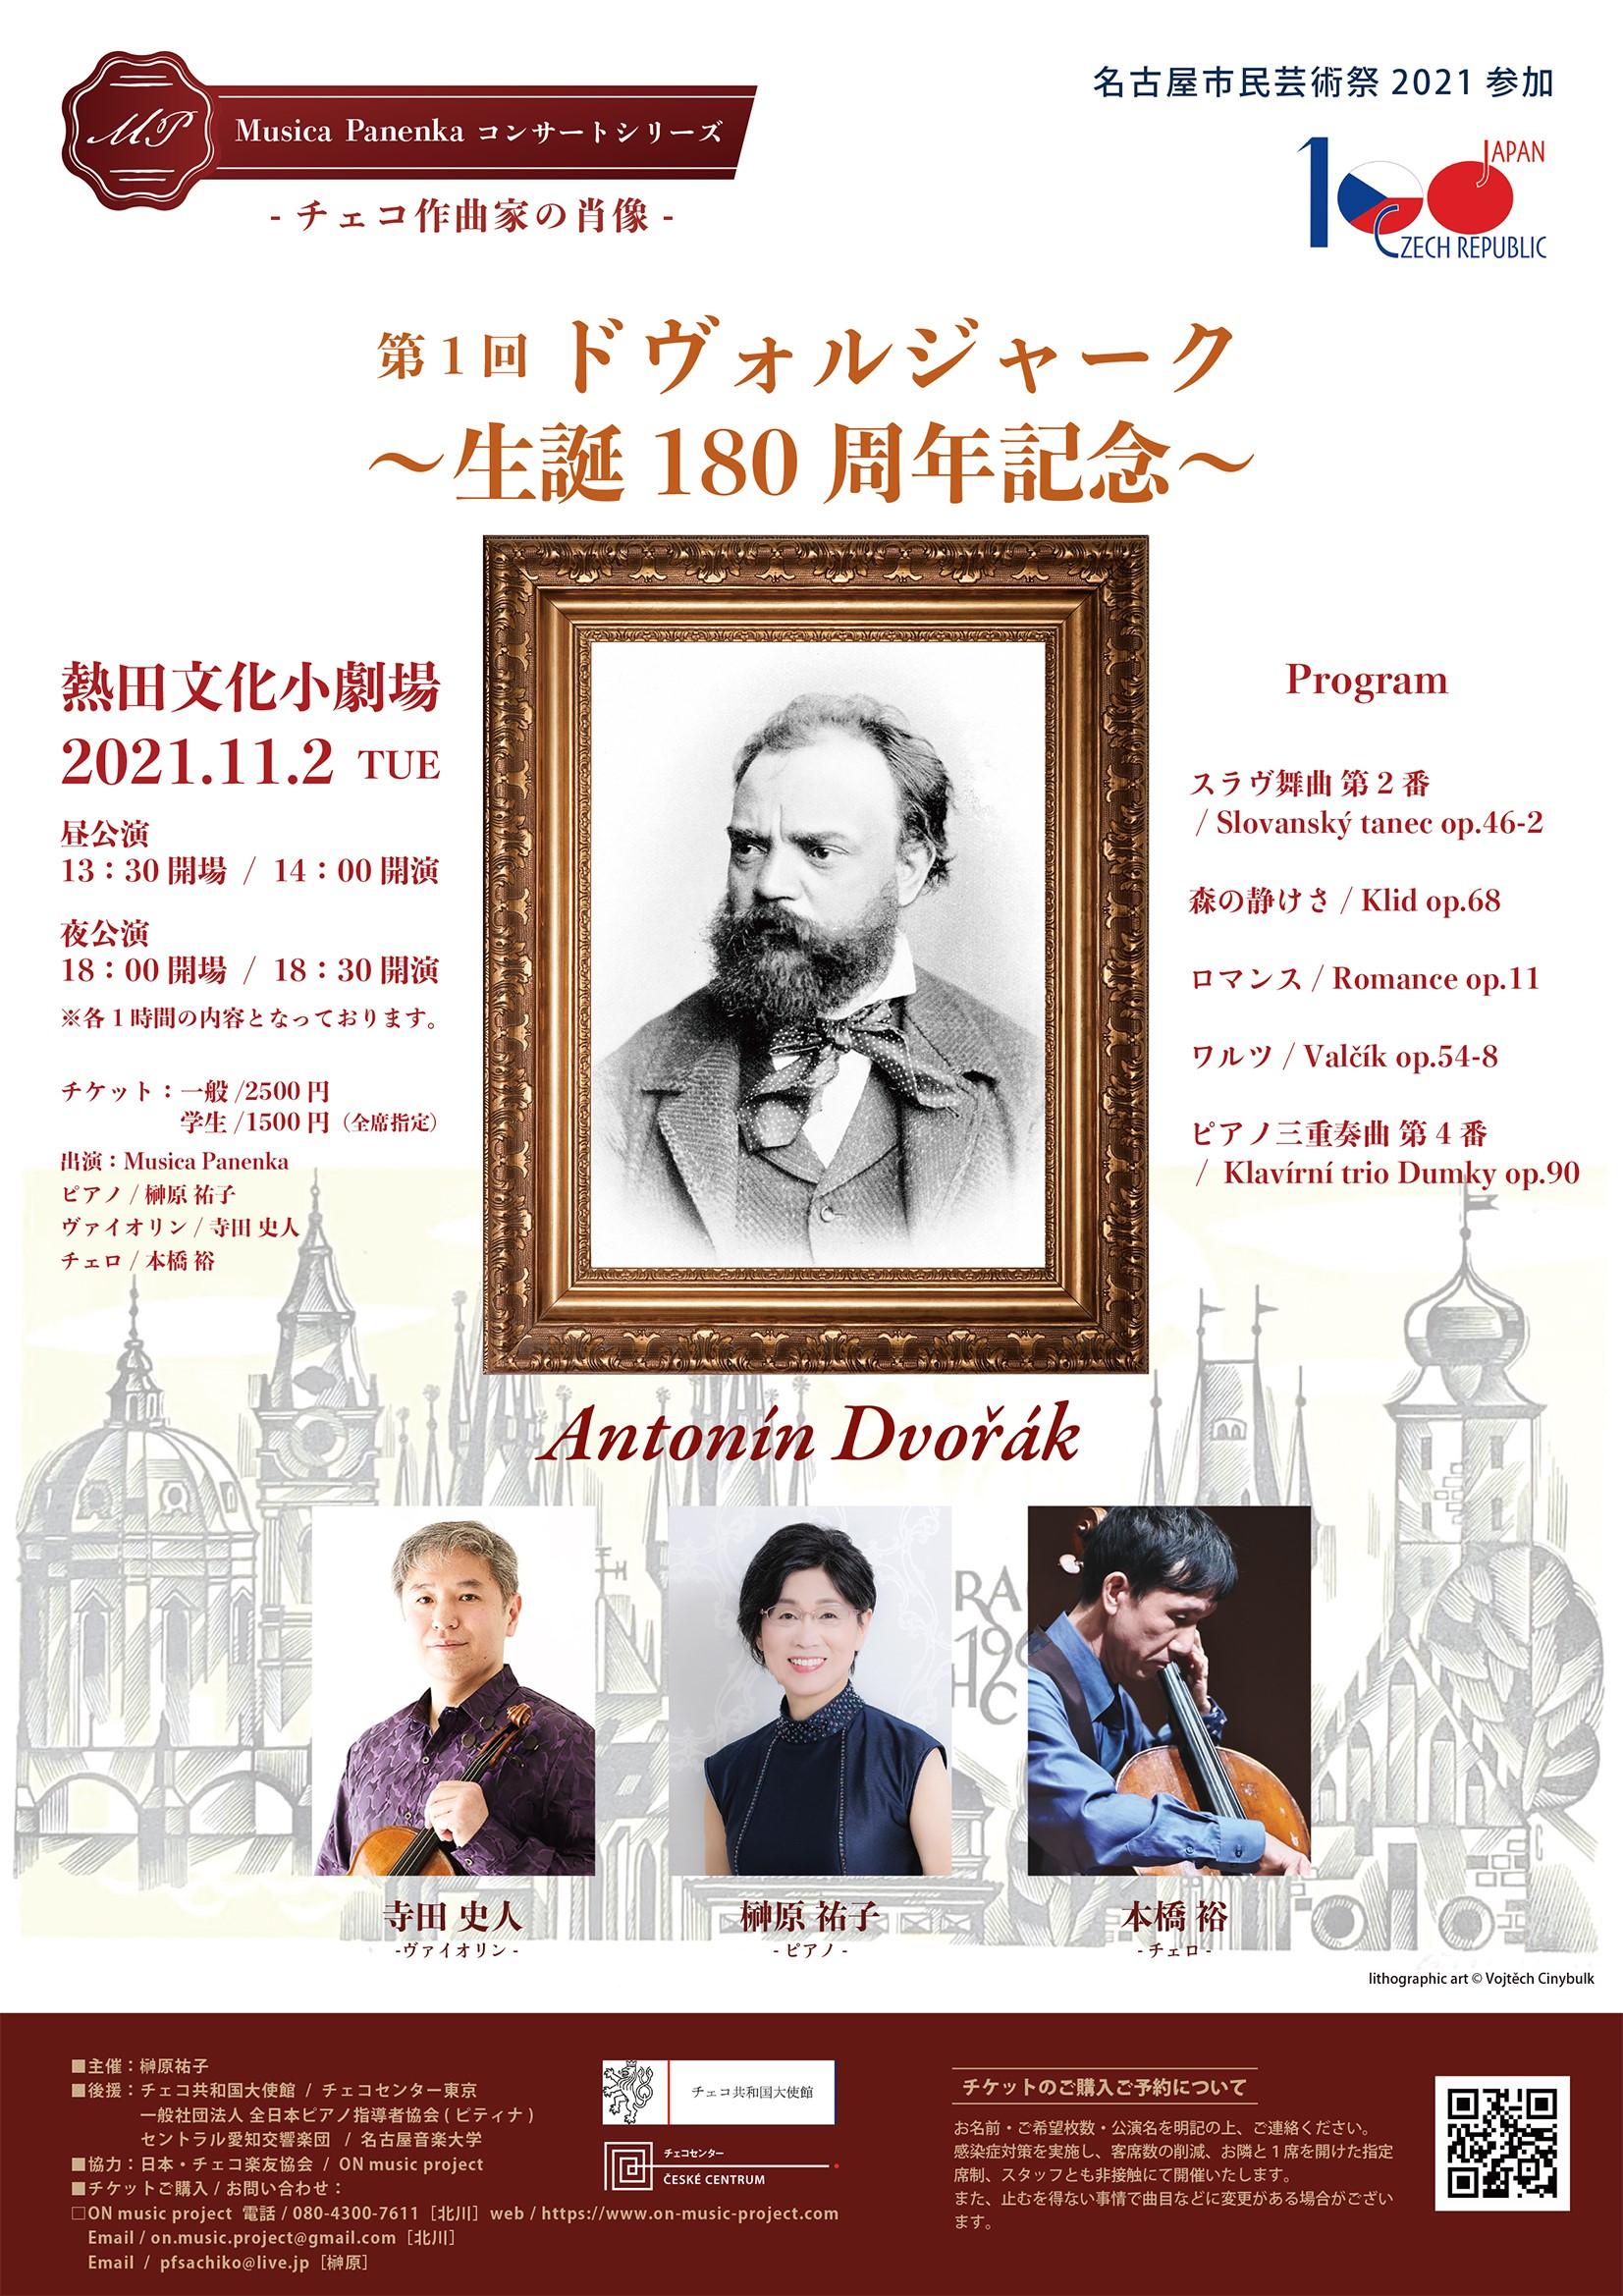 Musica Panenka コンサートシリーズ「チェコ作曲家の肖像」第1回 ドヴォルジャーク~生誕180周年記念~